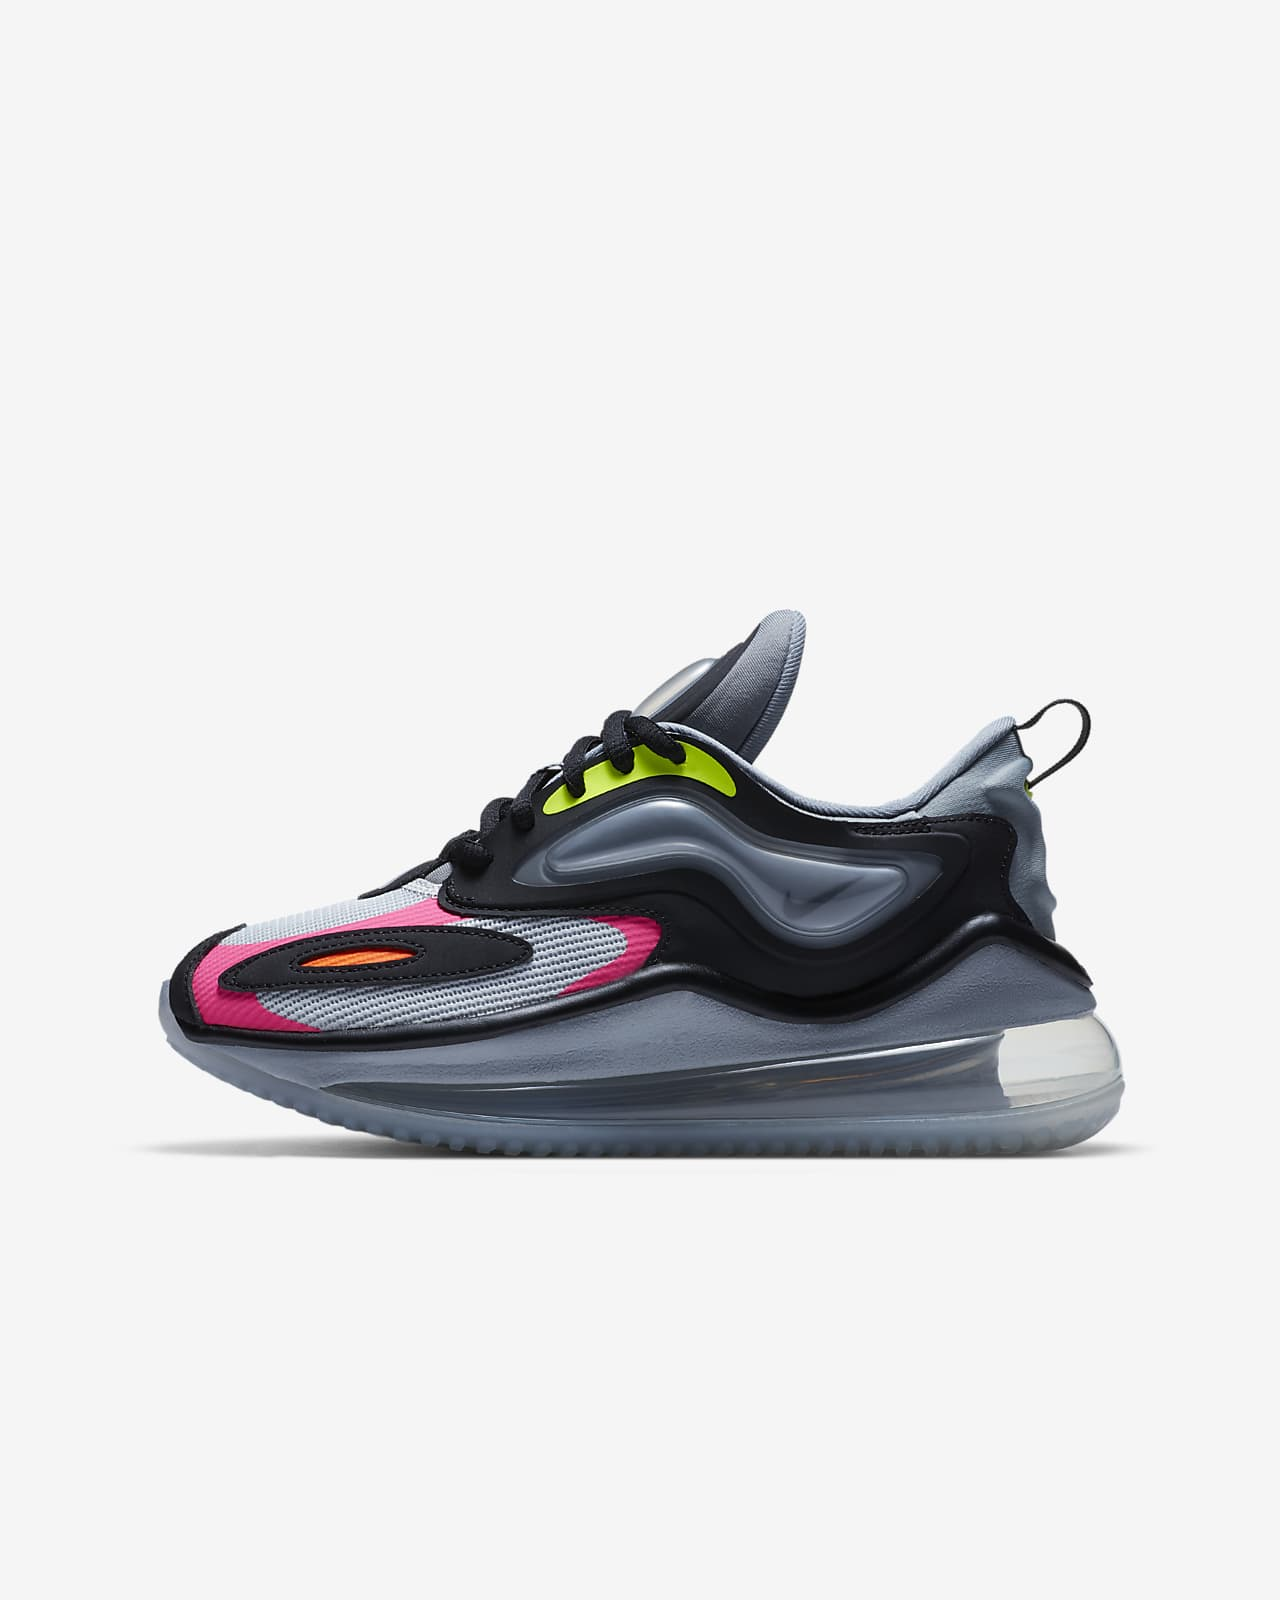 Calzado para niños talla grande Nike Air Max Zephyr